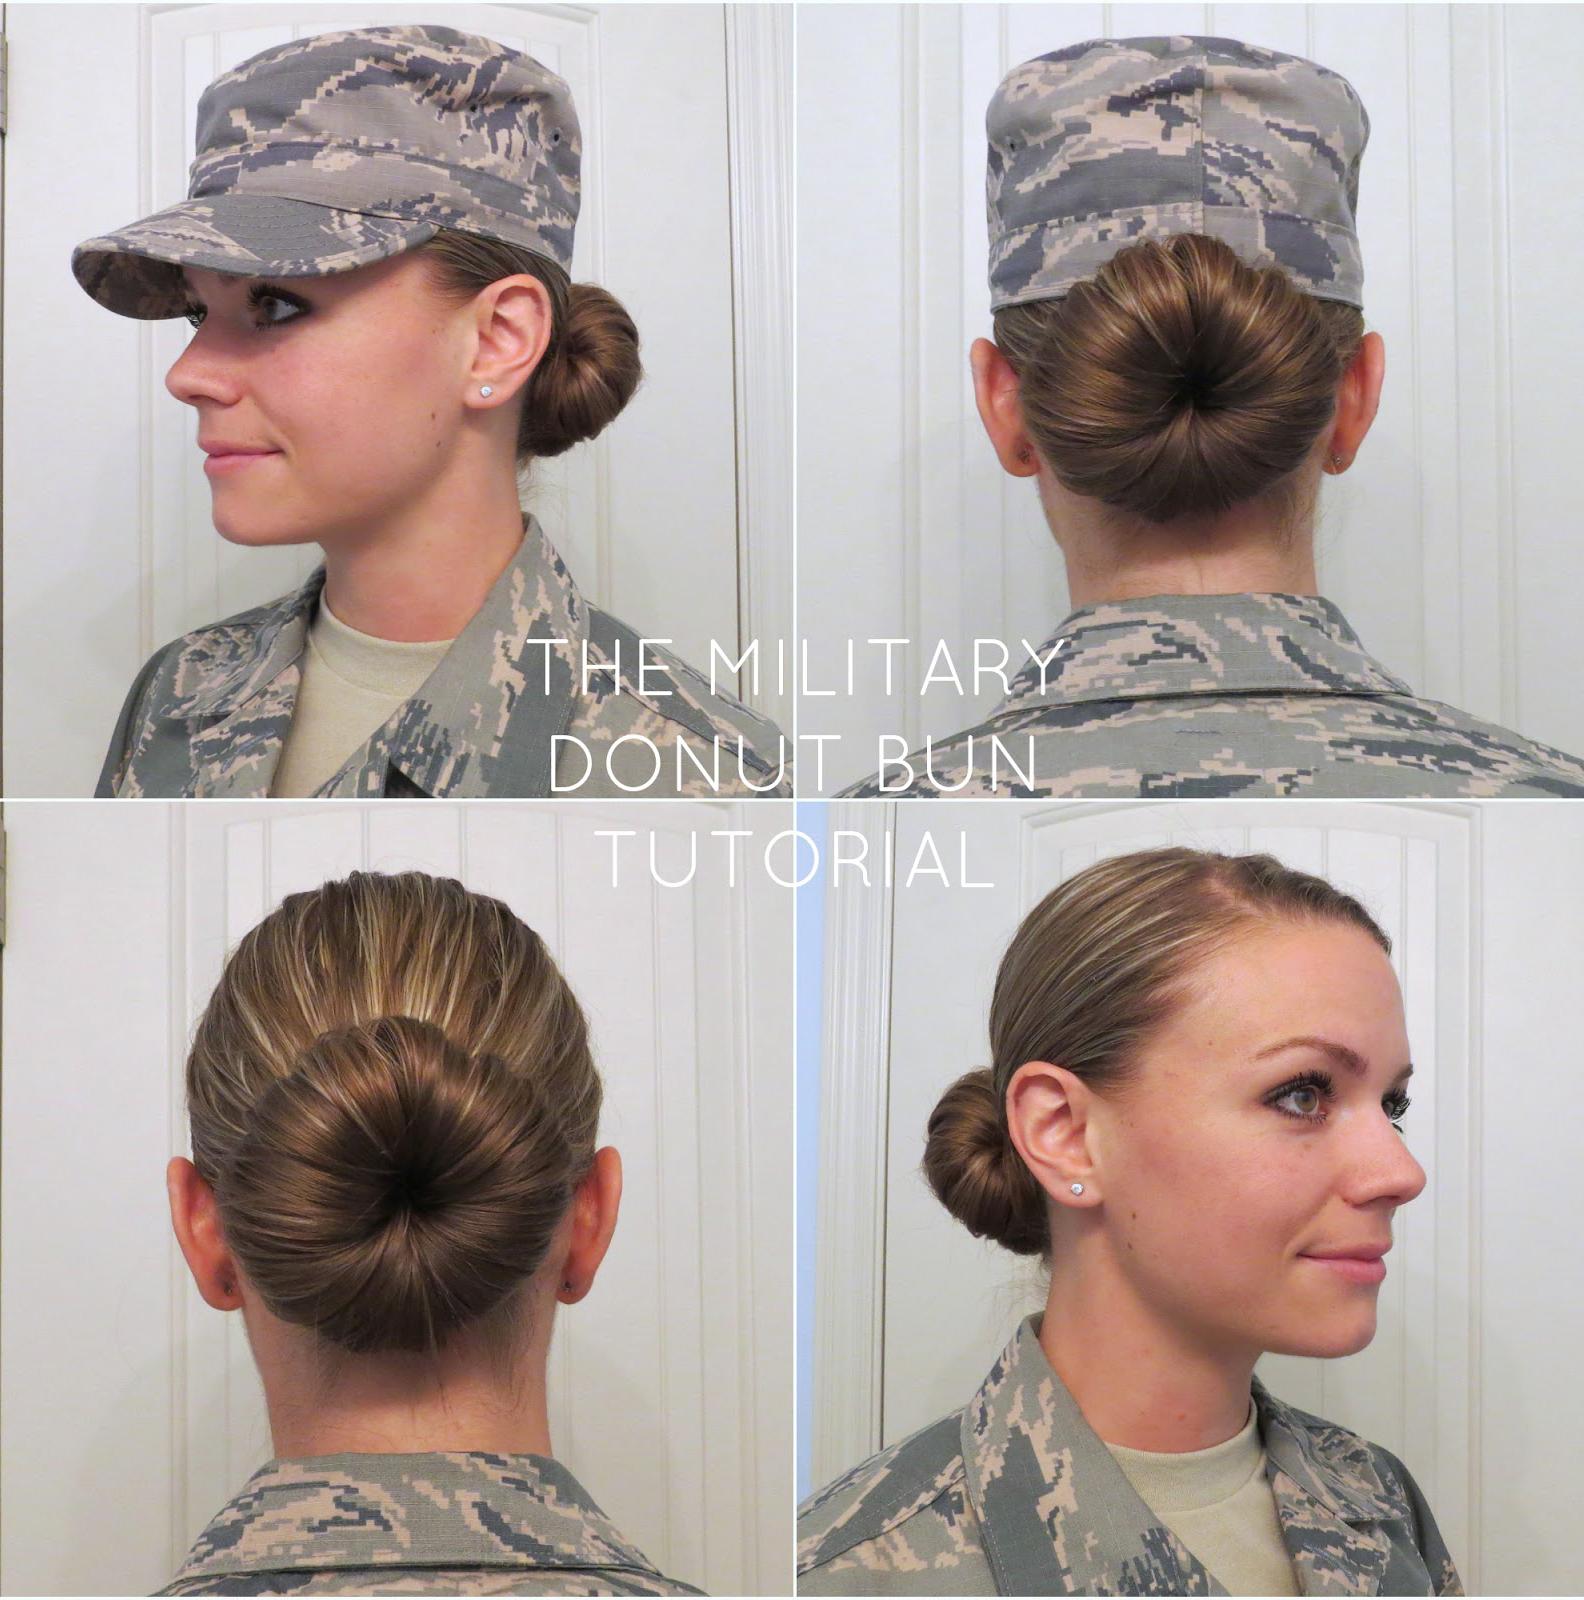 bye bye beehive │ a hairstyle blog: military bun tutorial